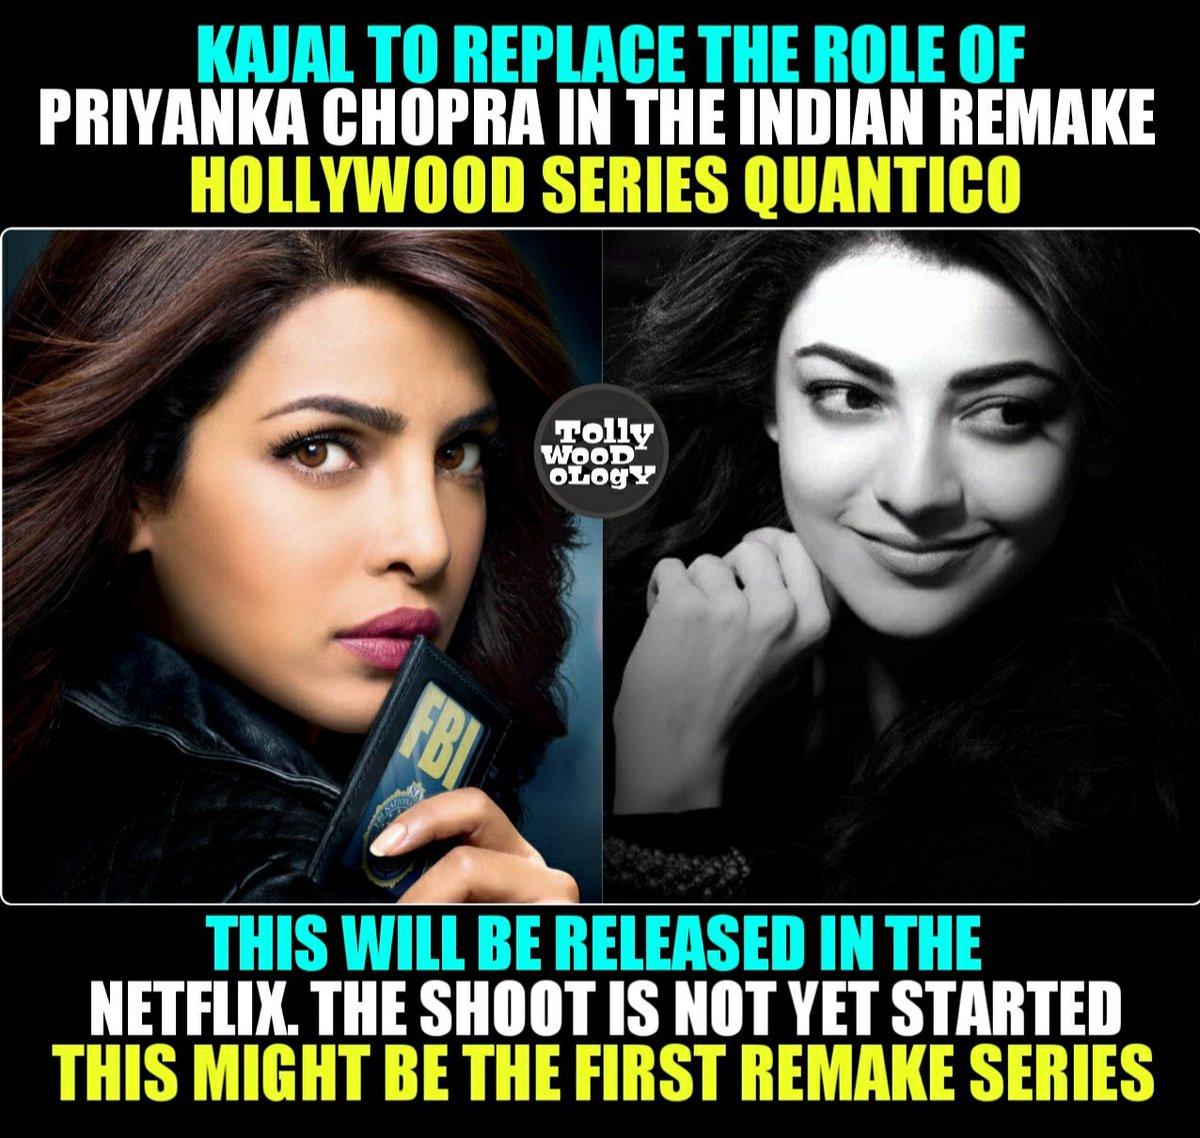 Tollywoodology On Twitter Indian Remake Of Quantico By Kajal Netfilxindia Kajal Tollywood Bollywood Quantico Kajaltollywod Priyankachopra Priyanka Kajalaggarwal Https T Co 1eakl7mukg